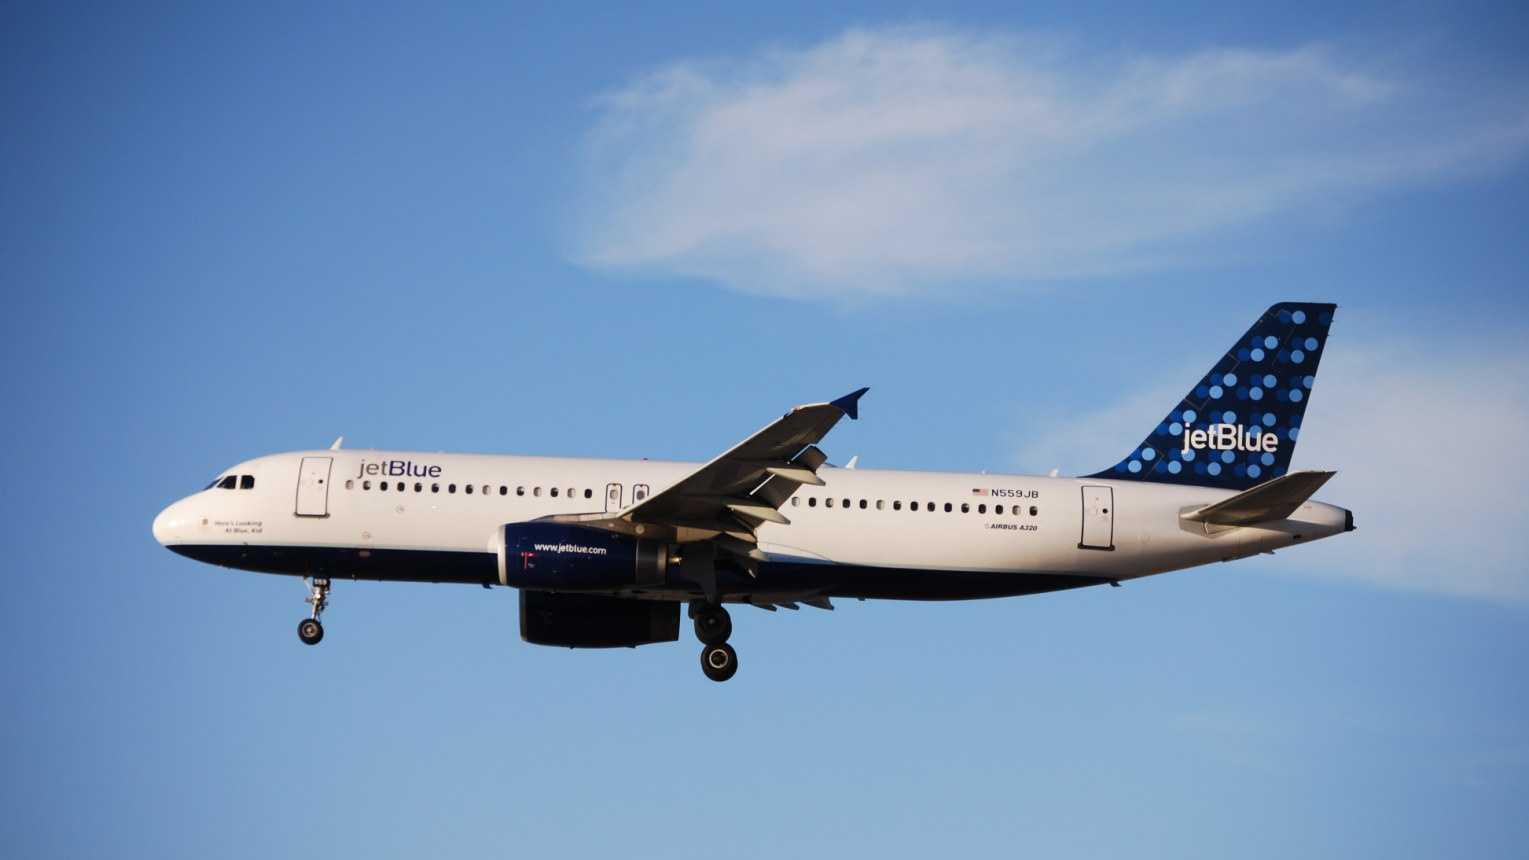 JetBlue Generic Plane 060713 PubDomain.jpg